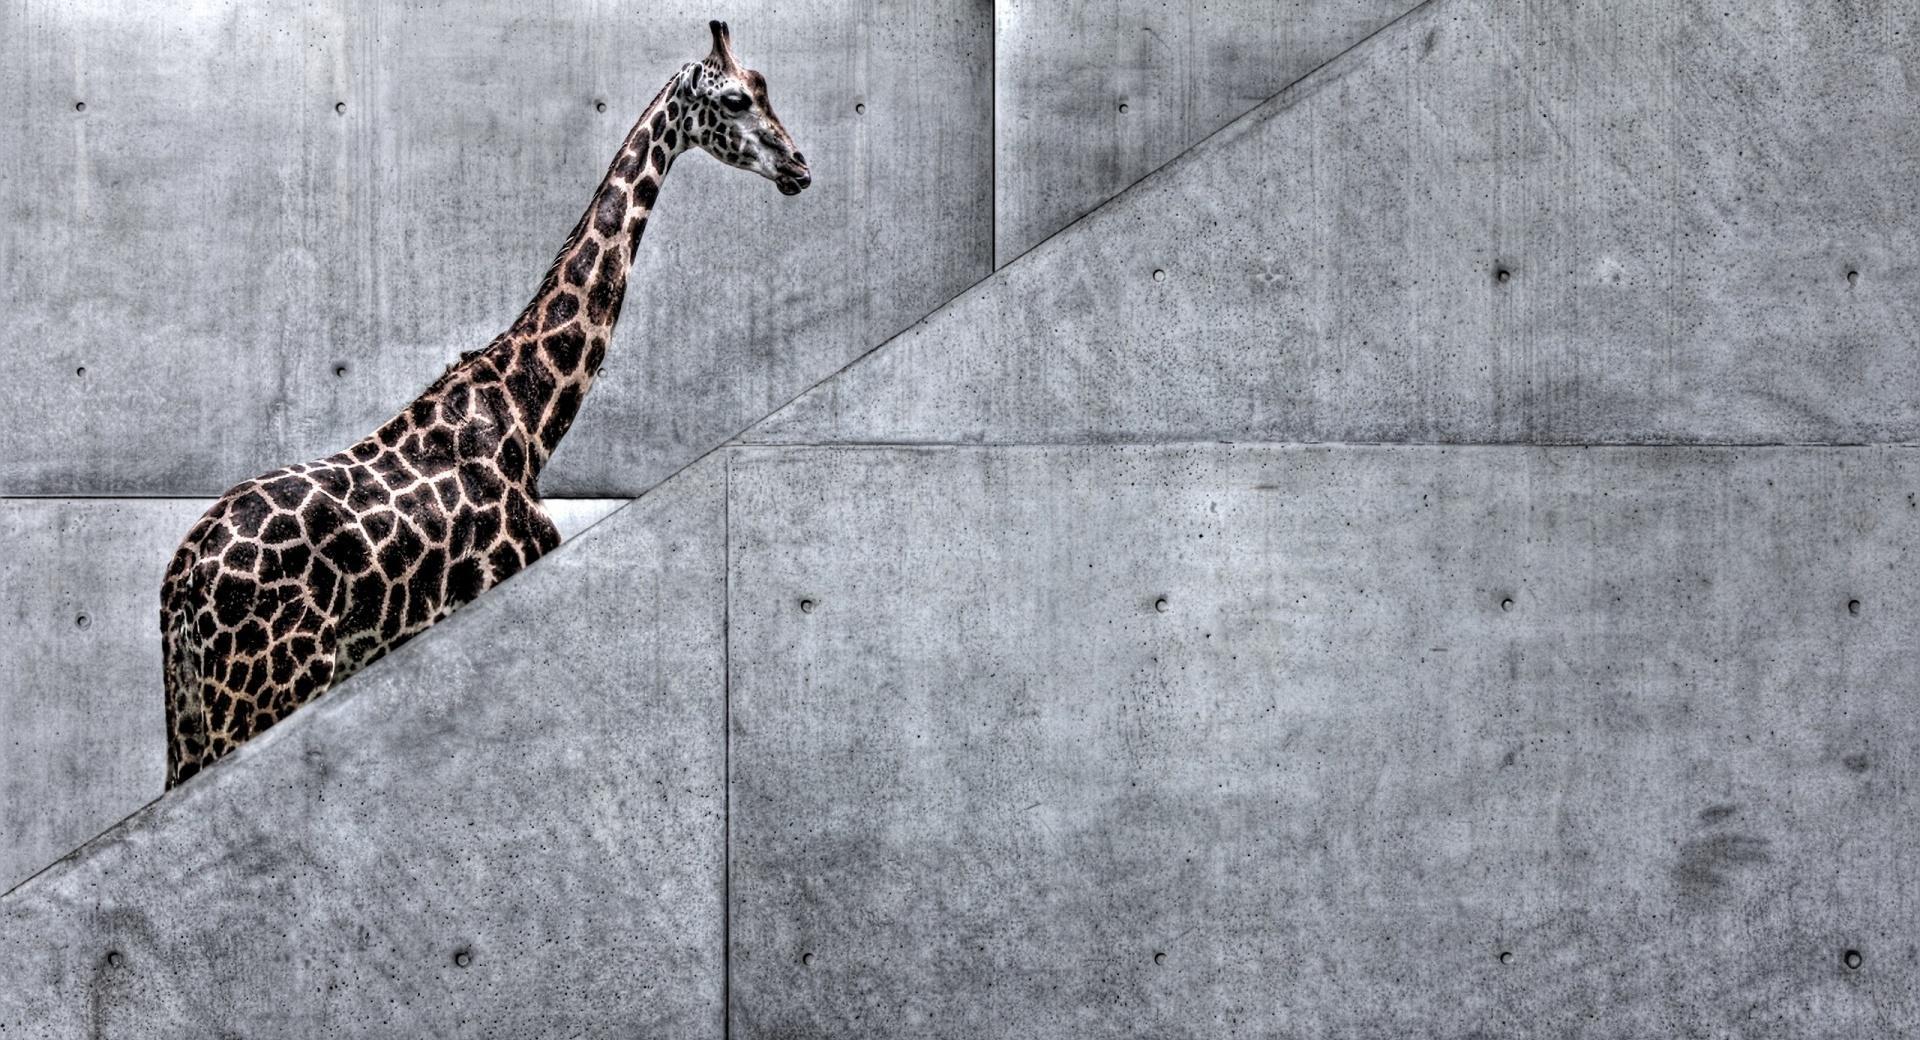 Giraffe Climbing Stairs wallpapers HD quality